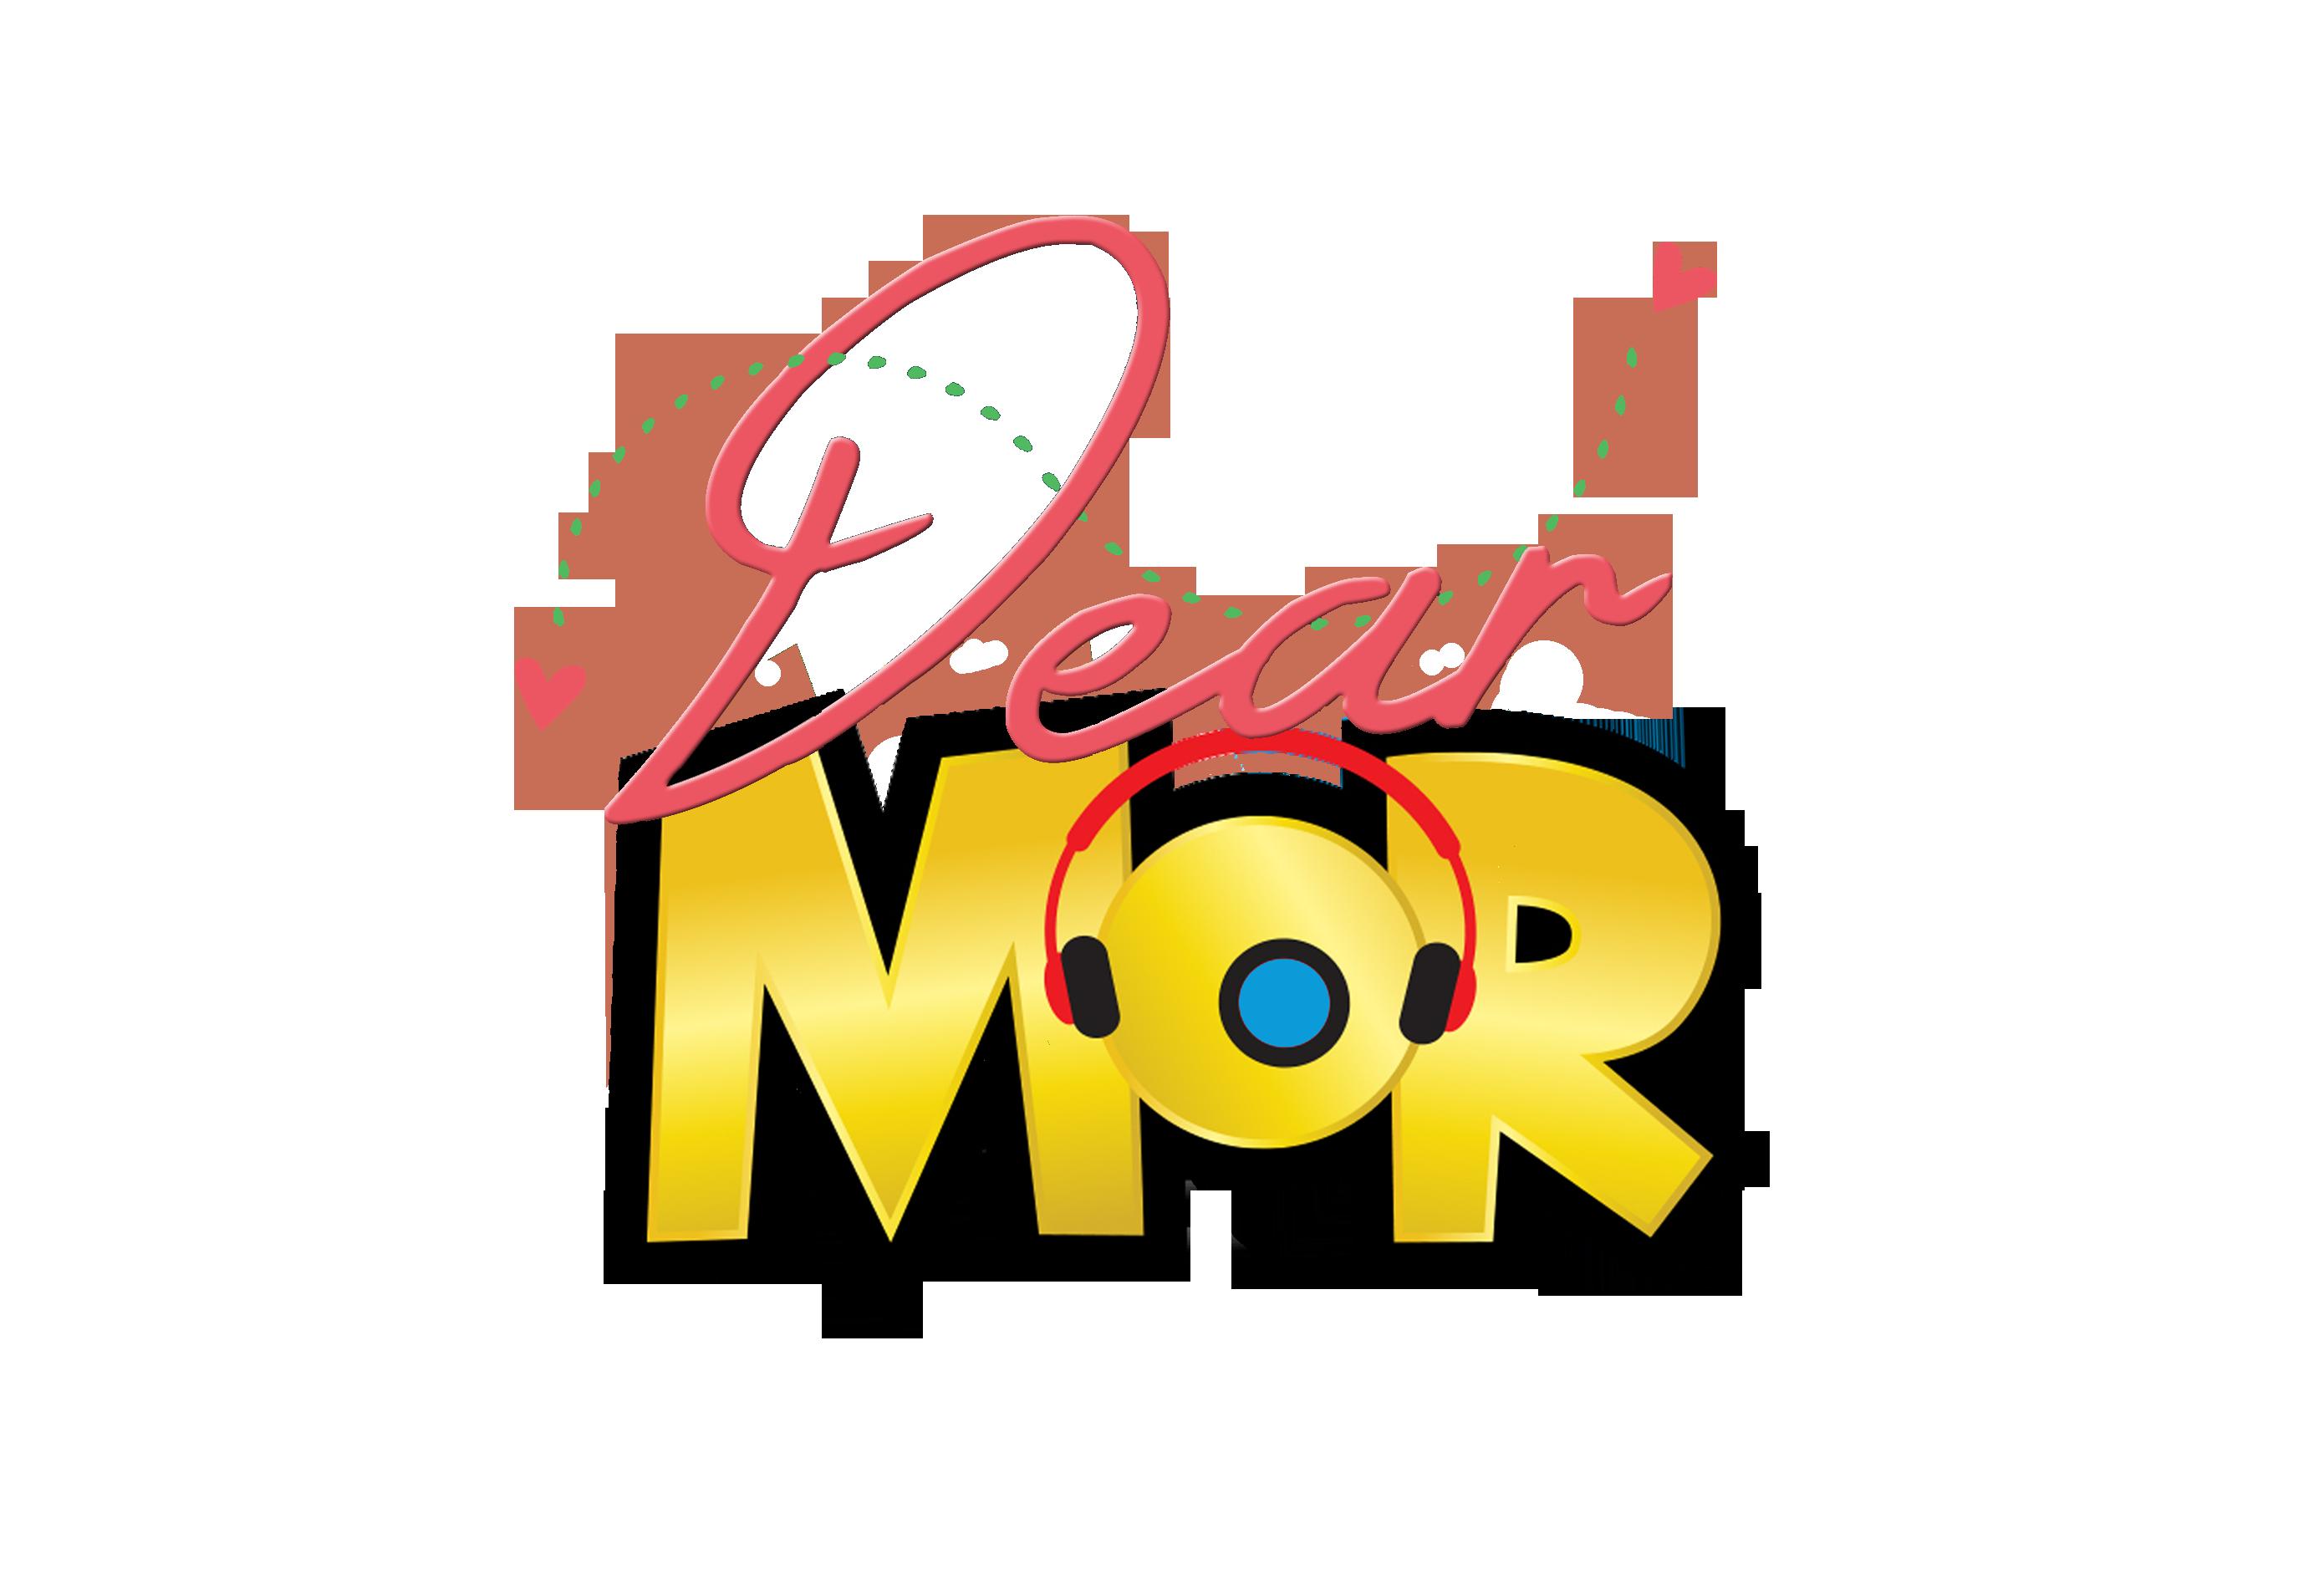 DEAR MOR (Saturday Edition)